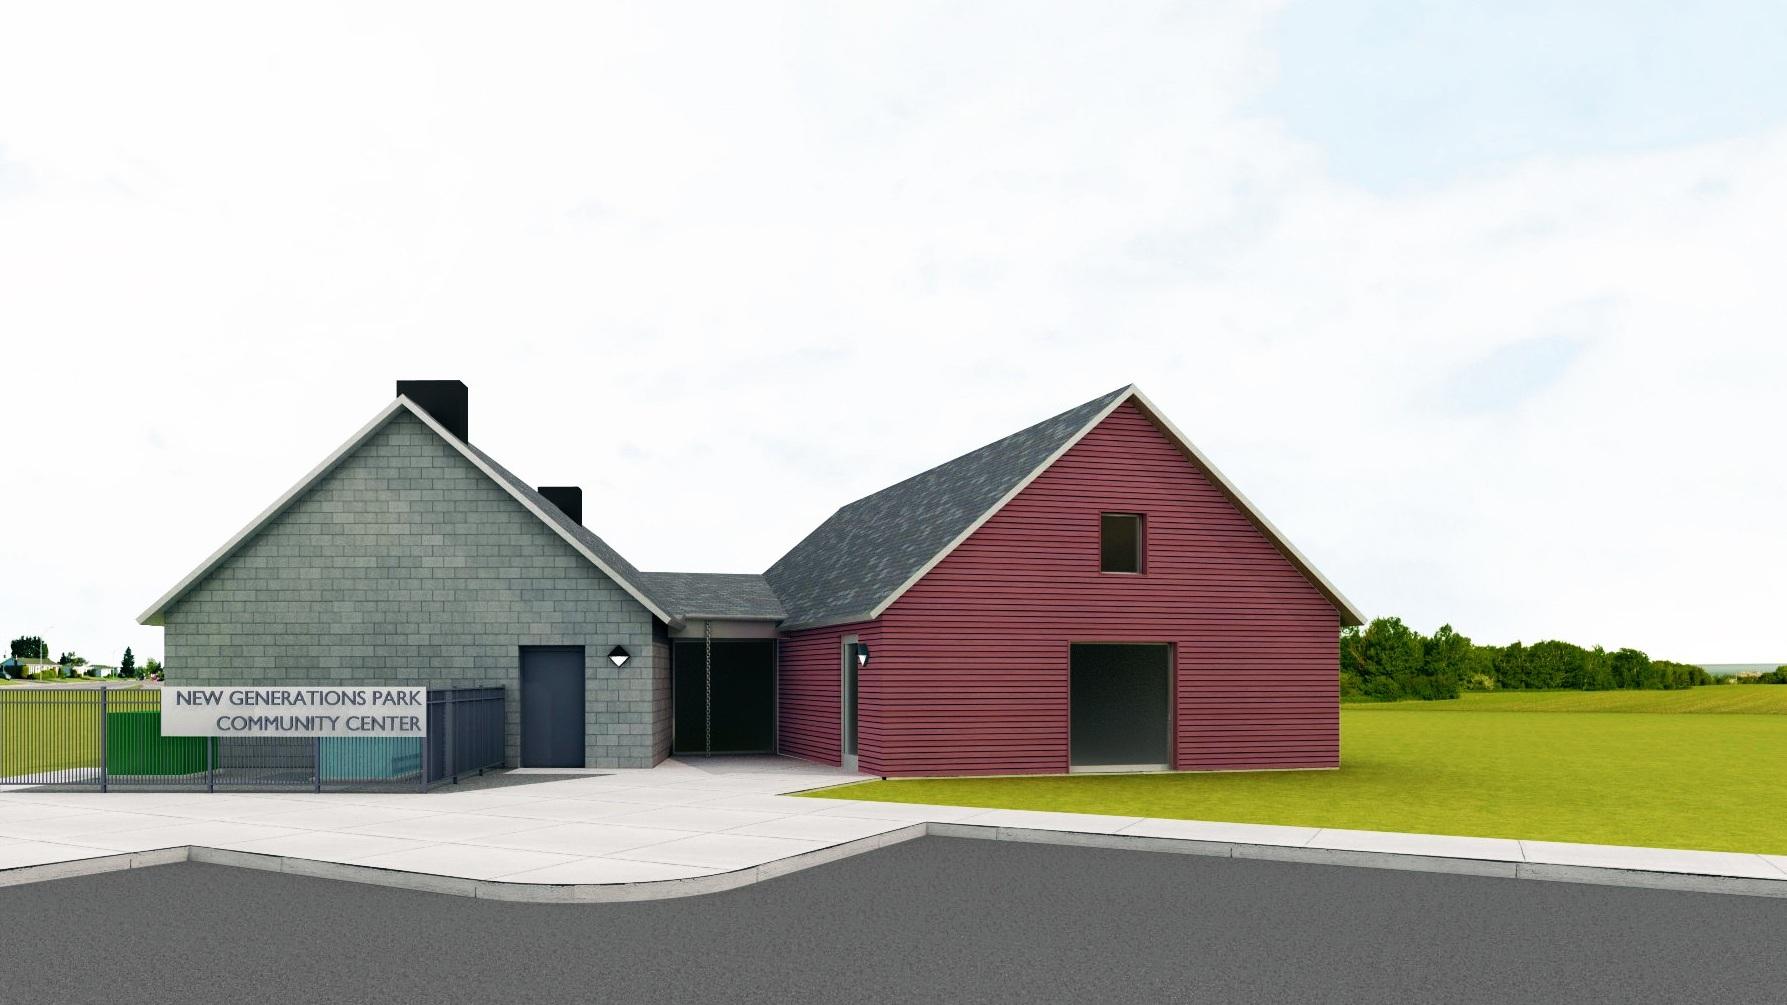 Rendering - New Generations Park - Bismarck Parks & Recreation District